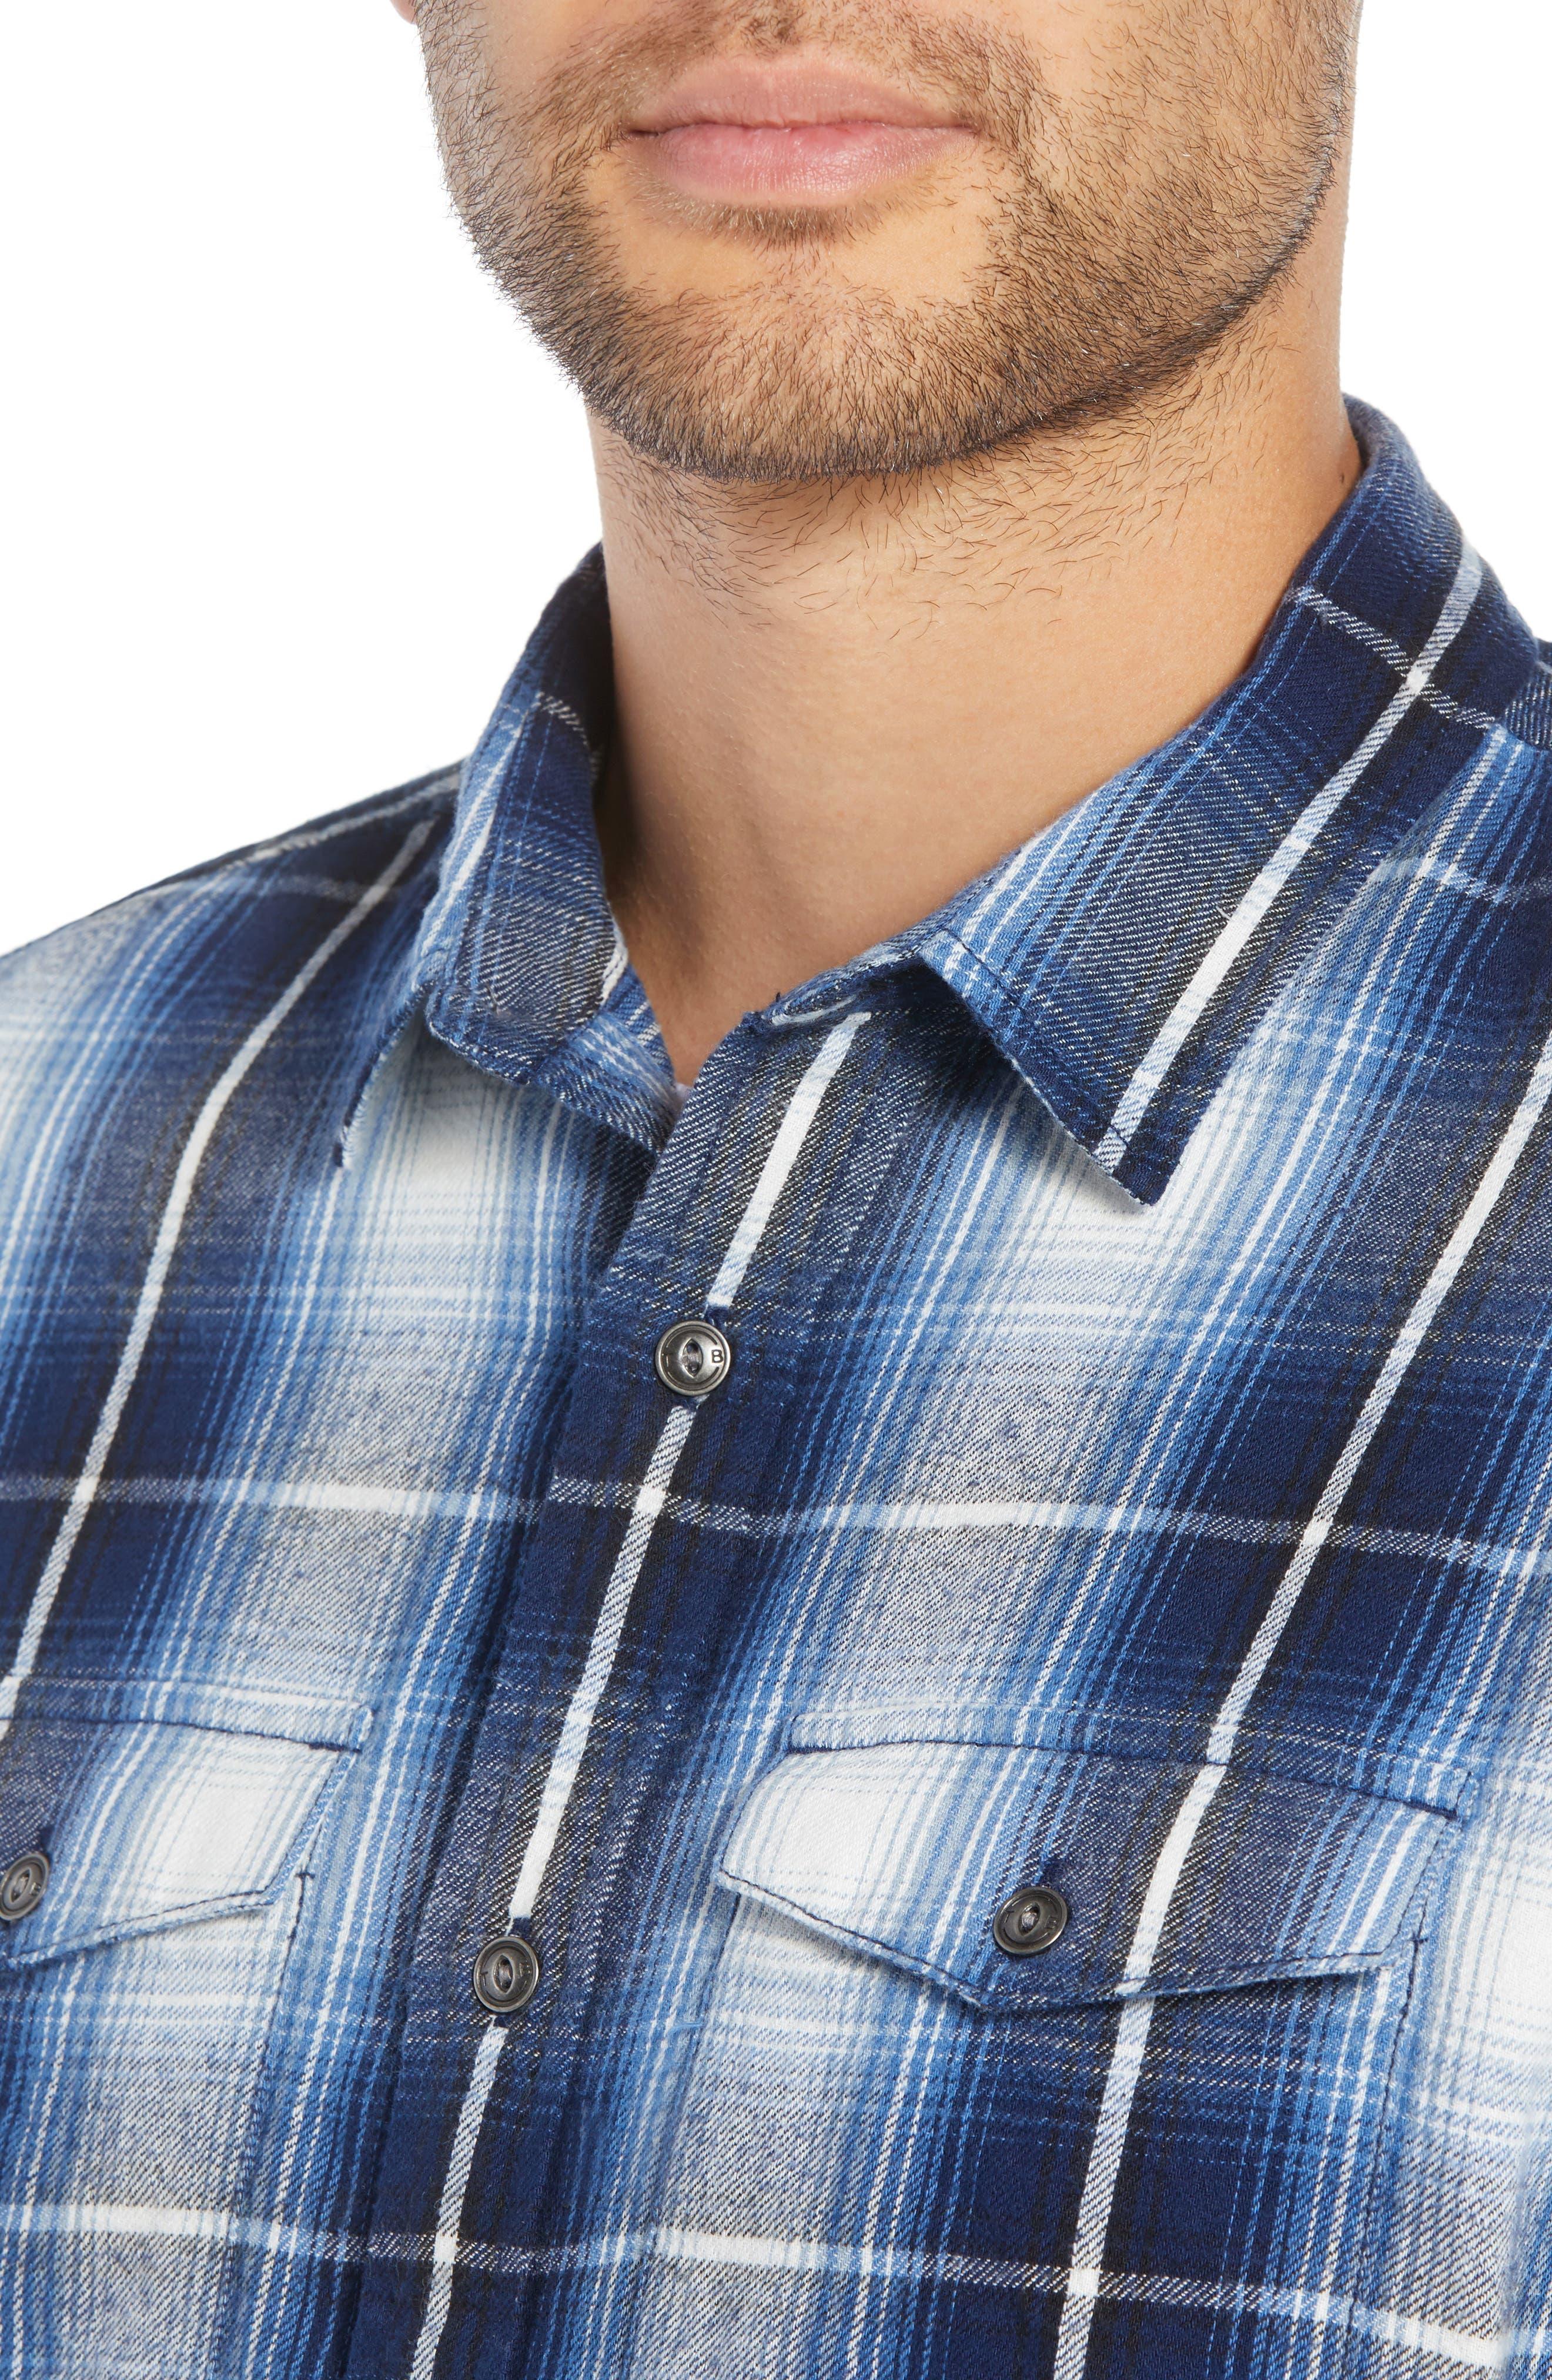 Slim Fit Plaid Flap Pocket Sport Shirt,                             Alternate thumbnail 4, color,                             BLUE CASPIA RIVER PLAID